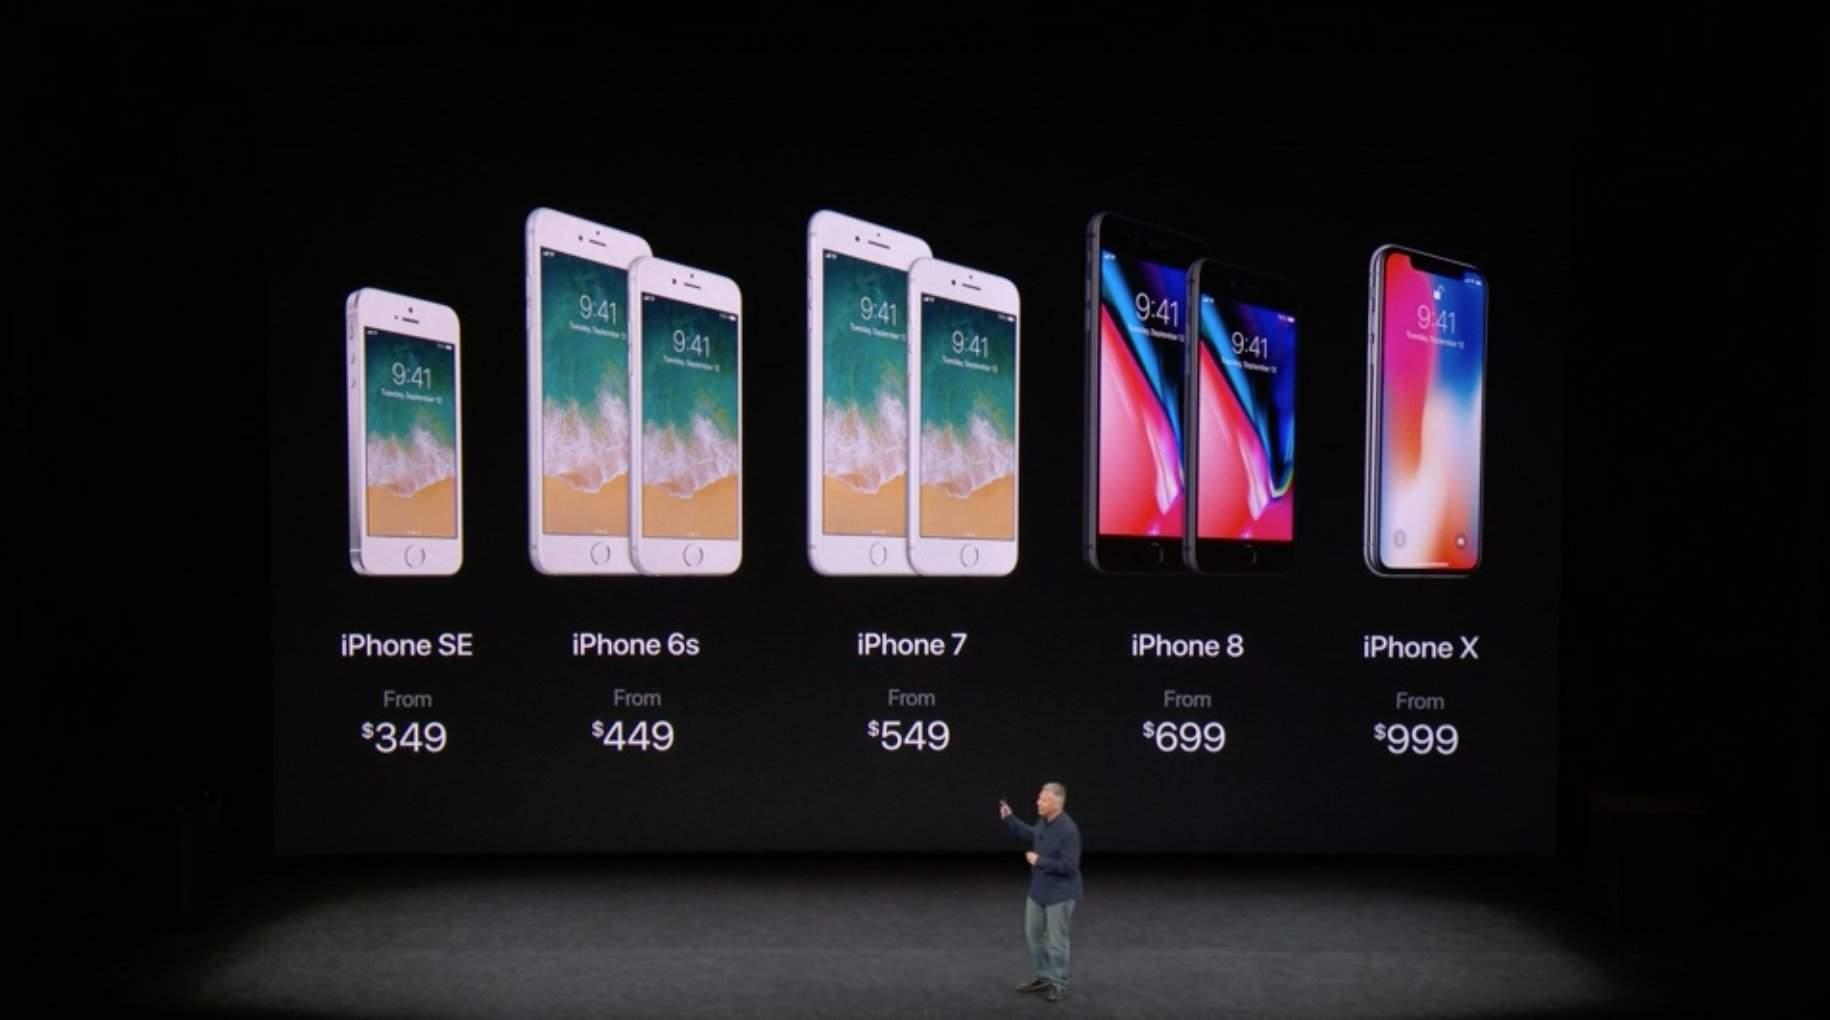 9cdfec60161 iPhone X no convence, acciones caen 0.40% - economiahoy.mx